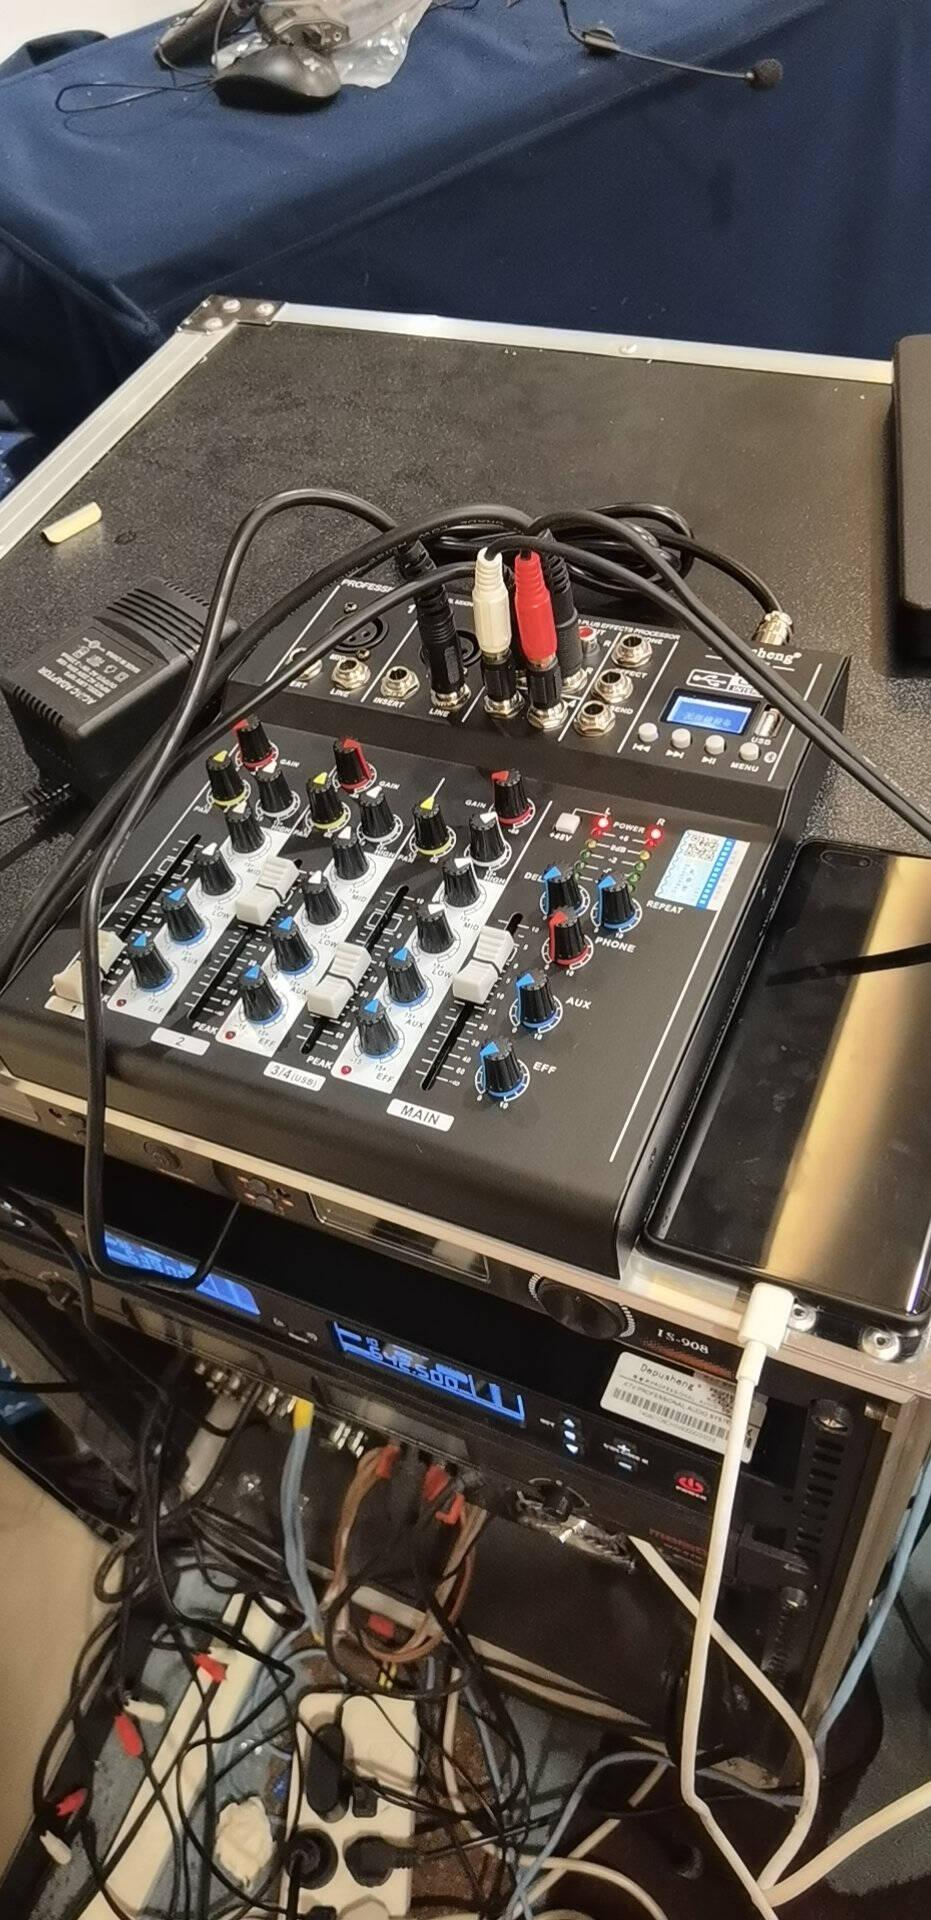 depusheng得普声F4专业4路调音台电脑录音小型家用效果KTV婚庆会议USB声卡蓝牙混响DE8USB声卡调音台